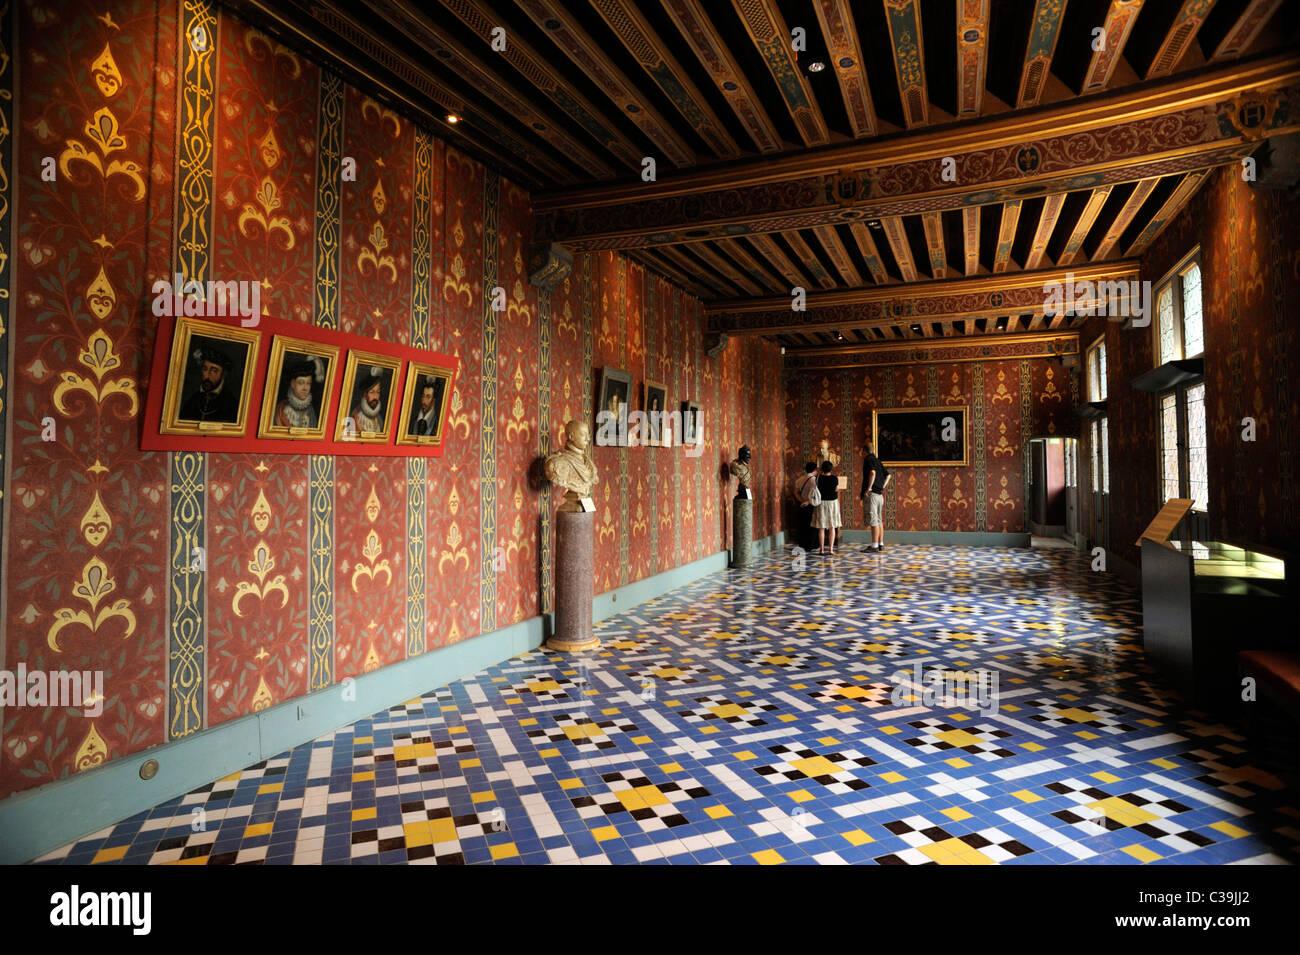 france, loire valley, blois, castle interior - Stock Image